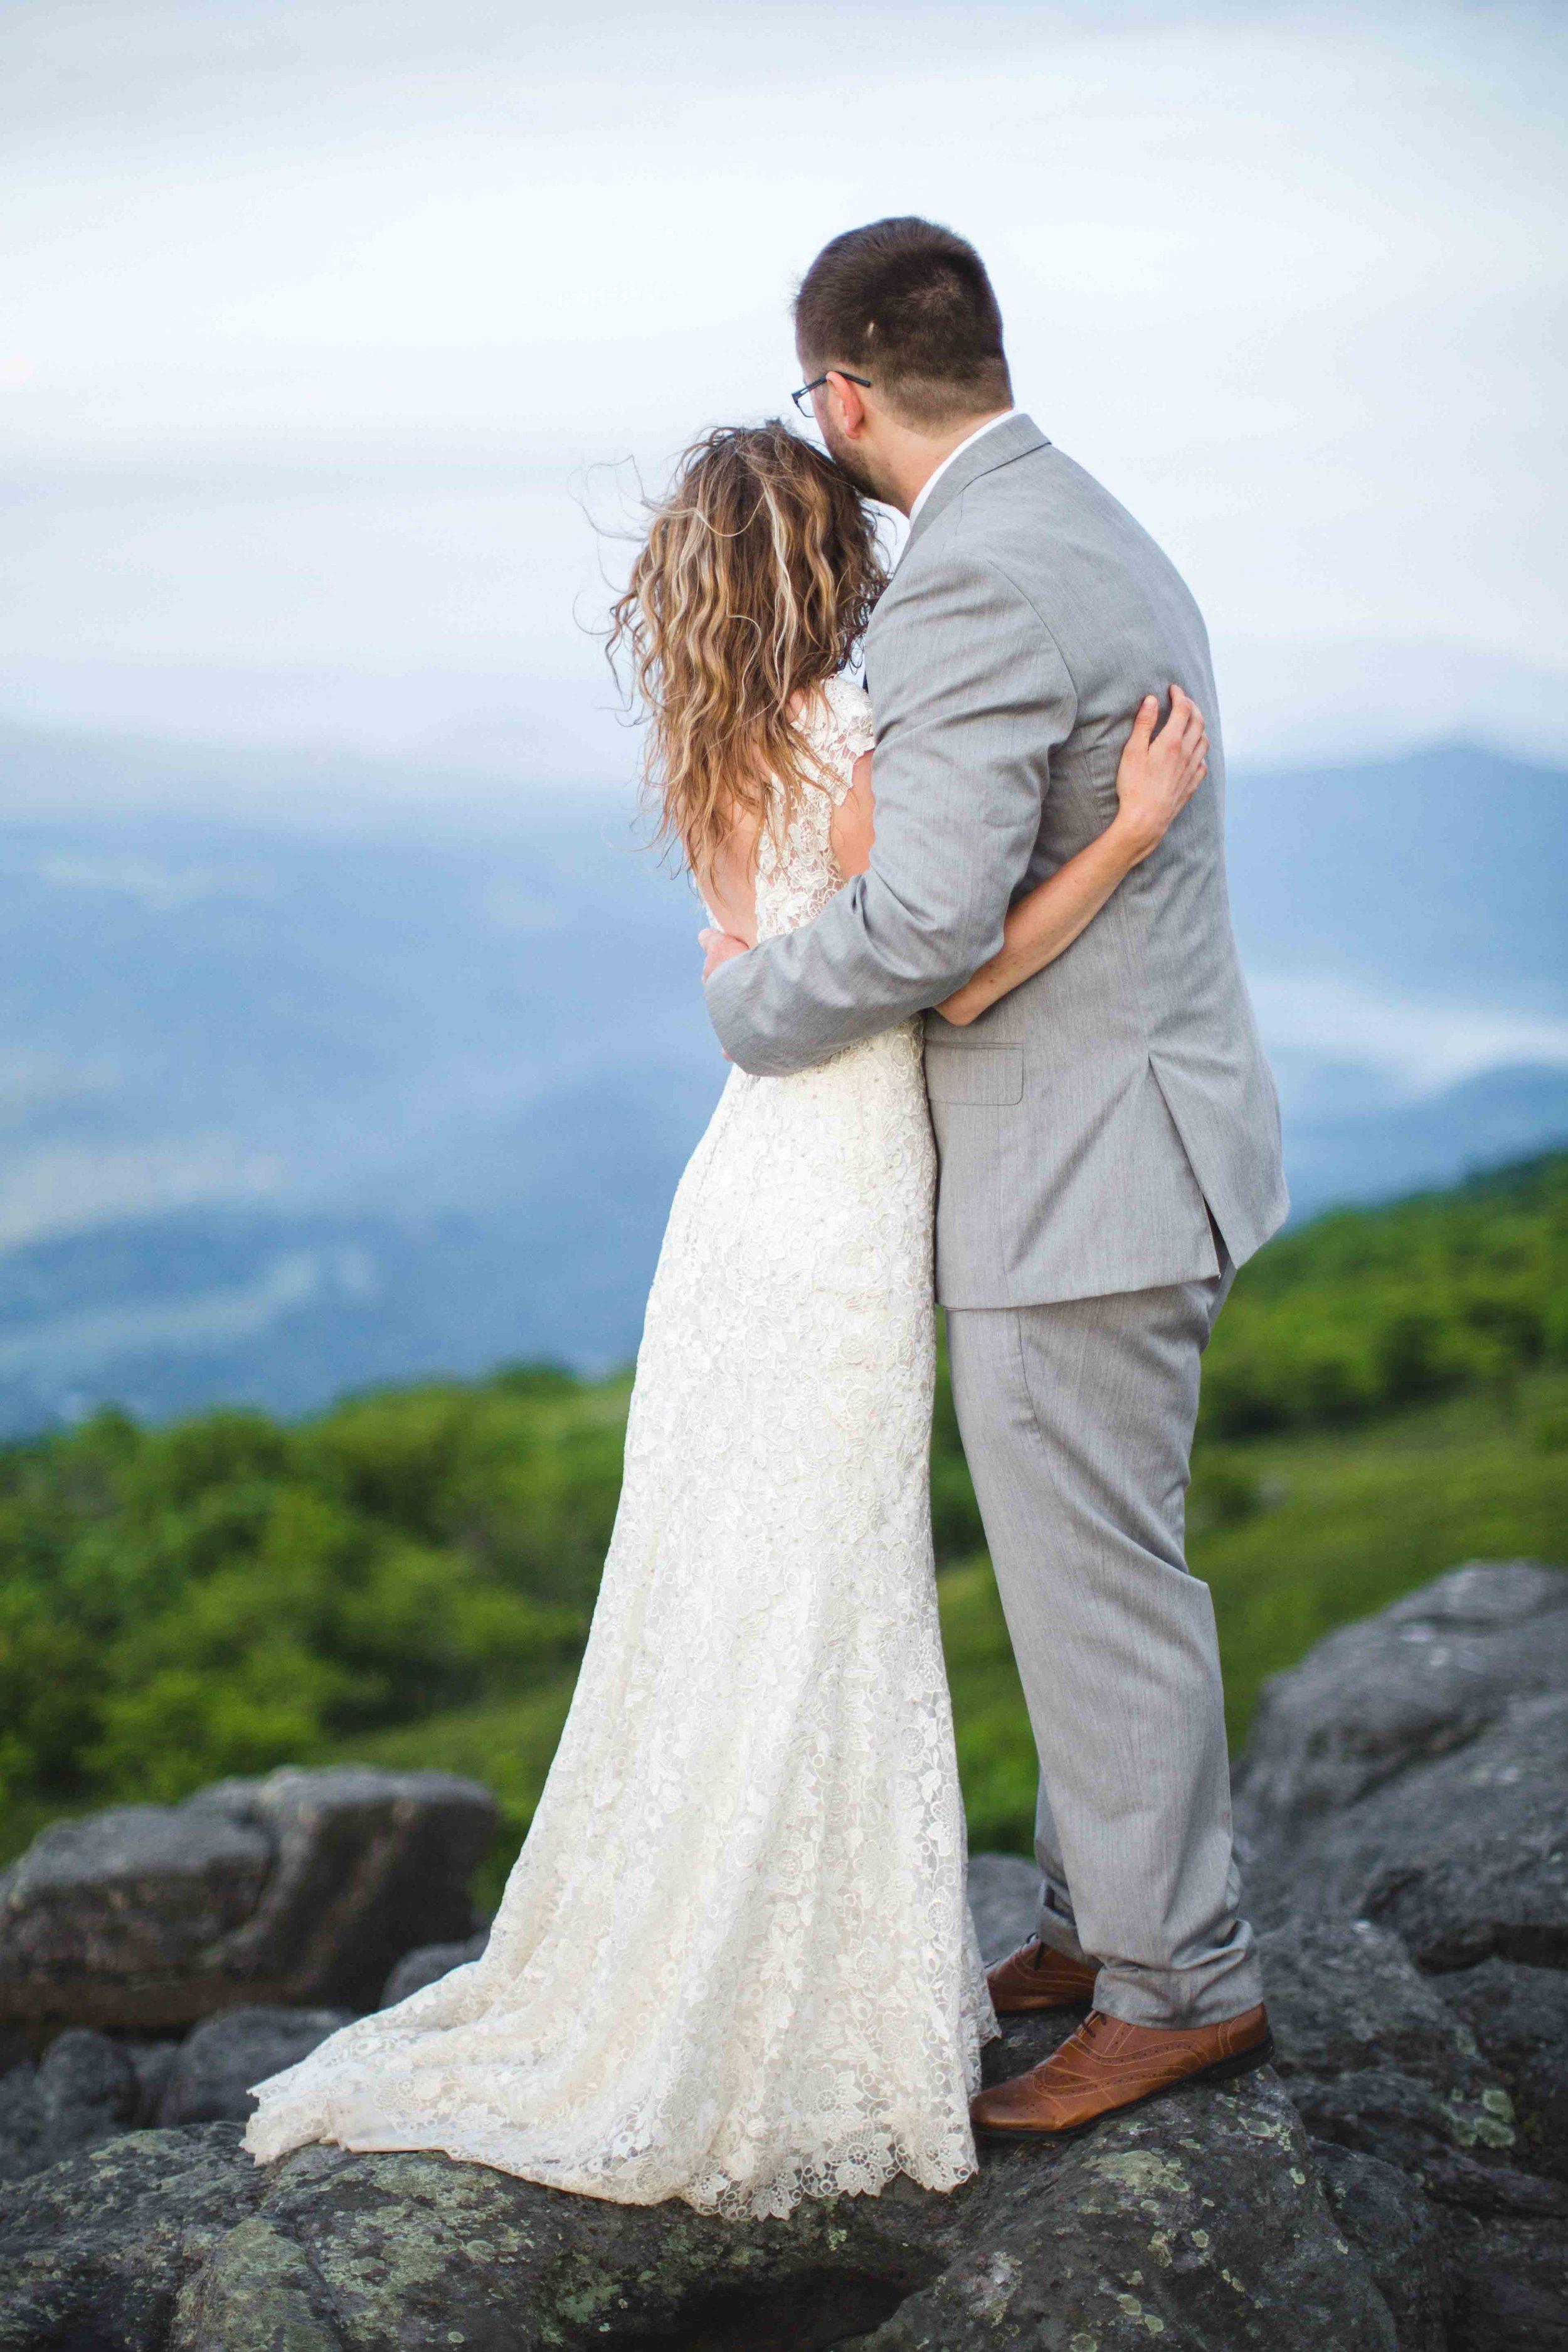 north-carolina-elopement-photographer-82.jpg